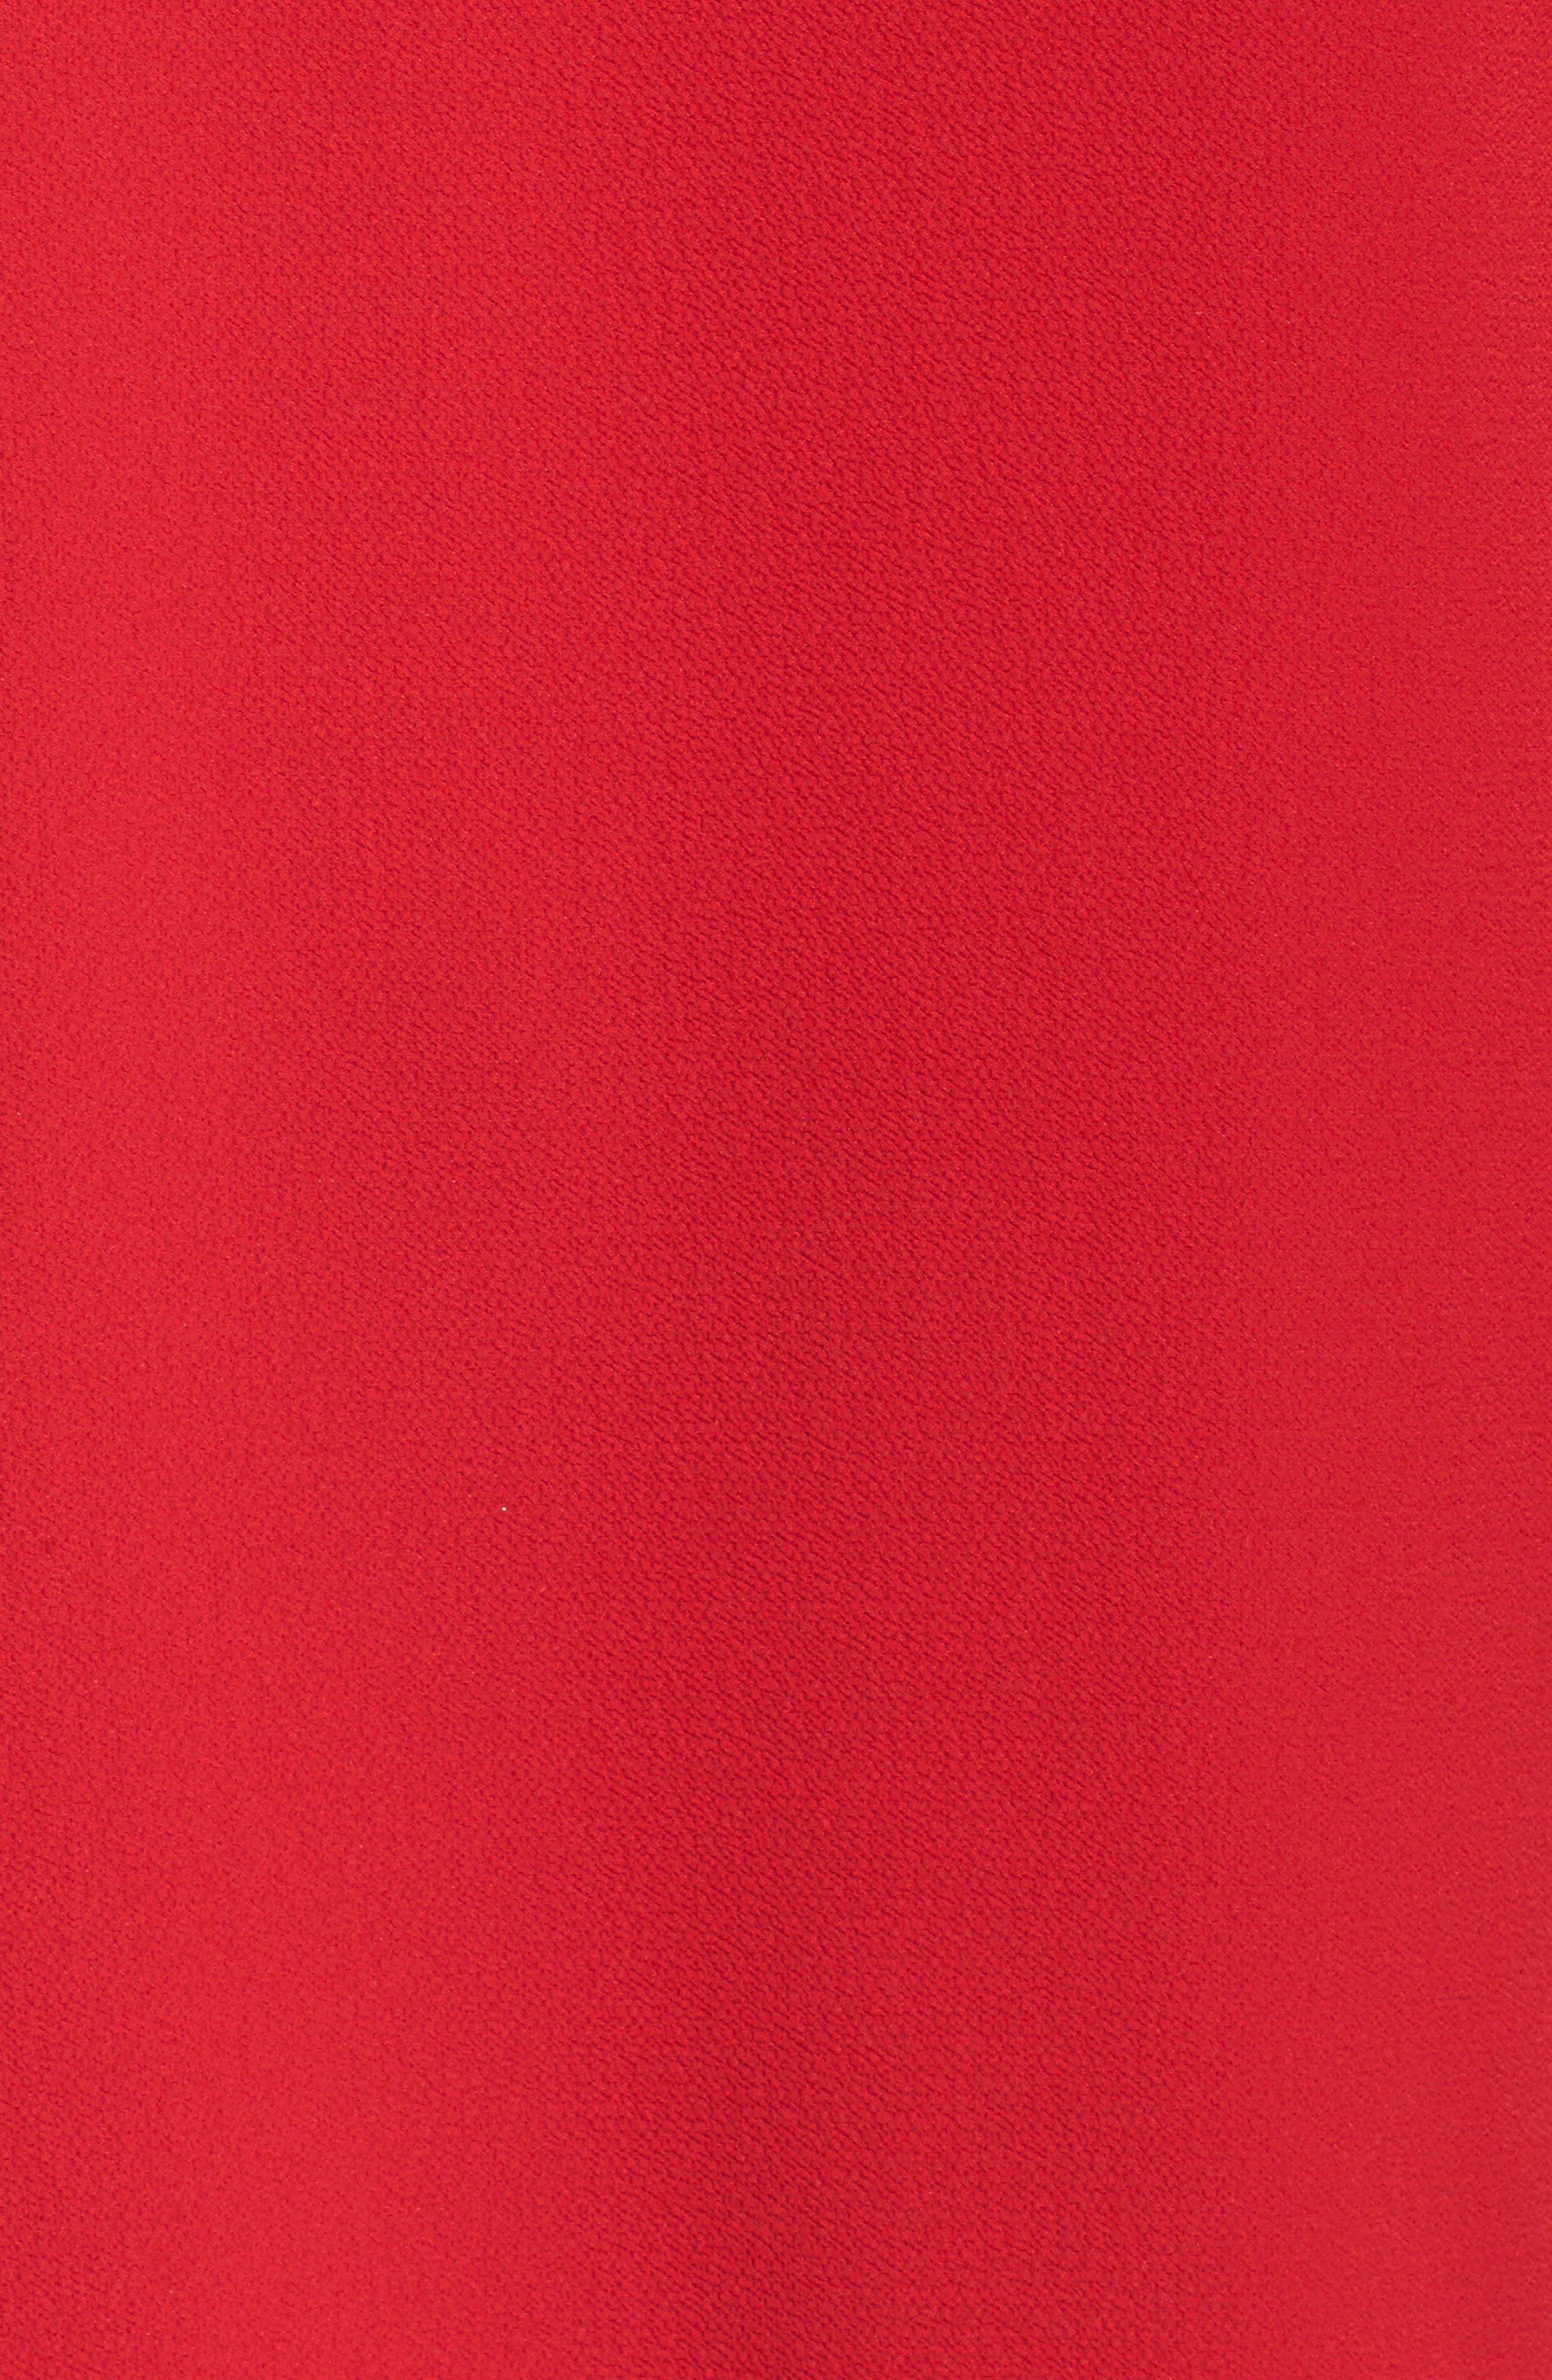 Alternate Image 5  - Vince Camuto Asymmetrical Ruffle Cold Shoulder Top (Plus Size)